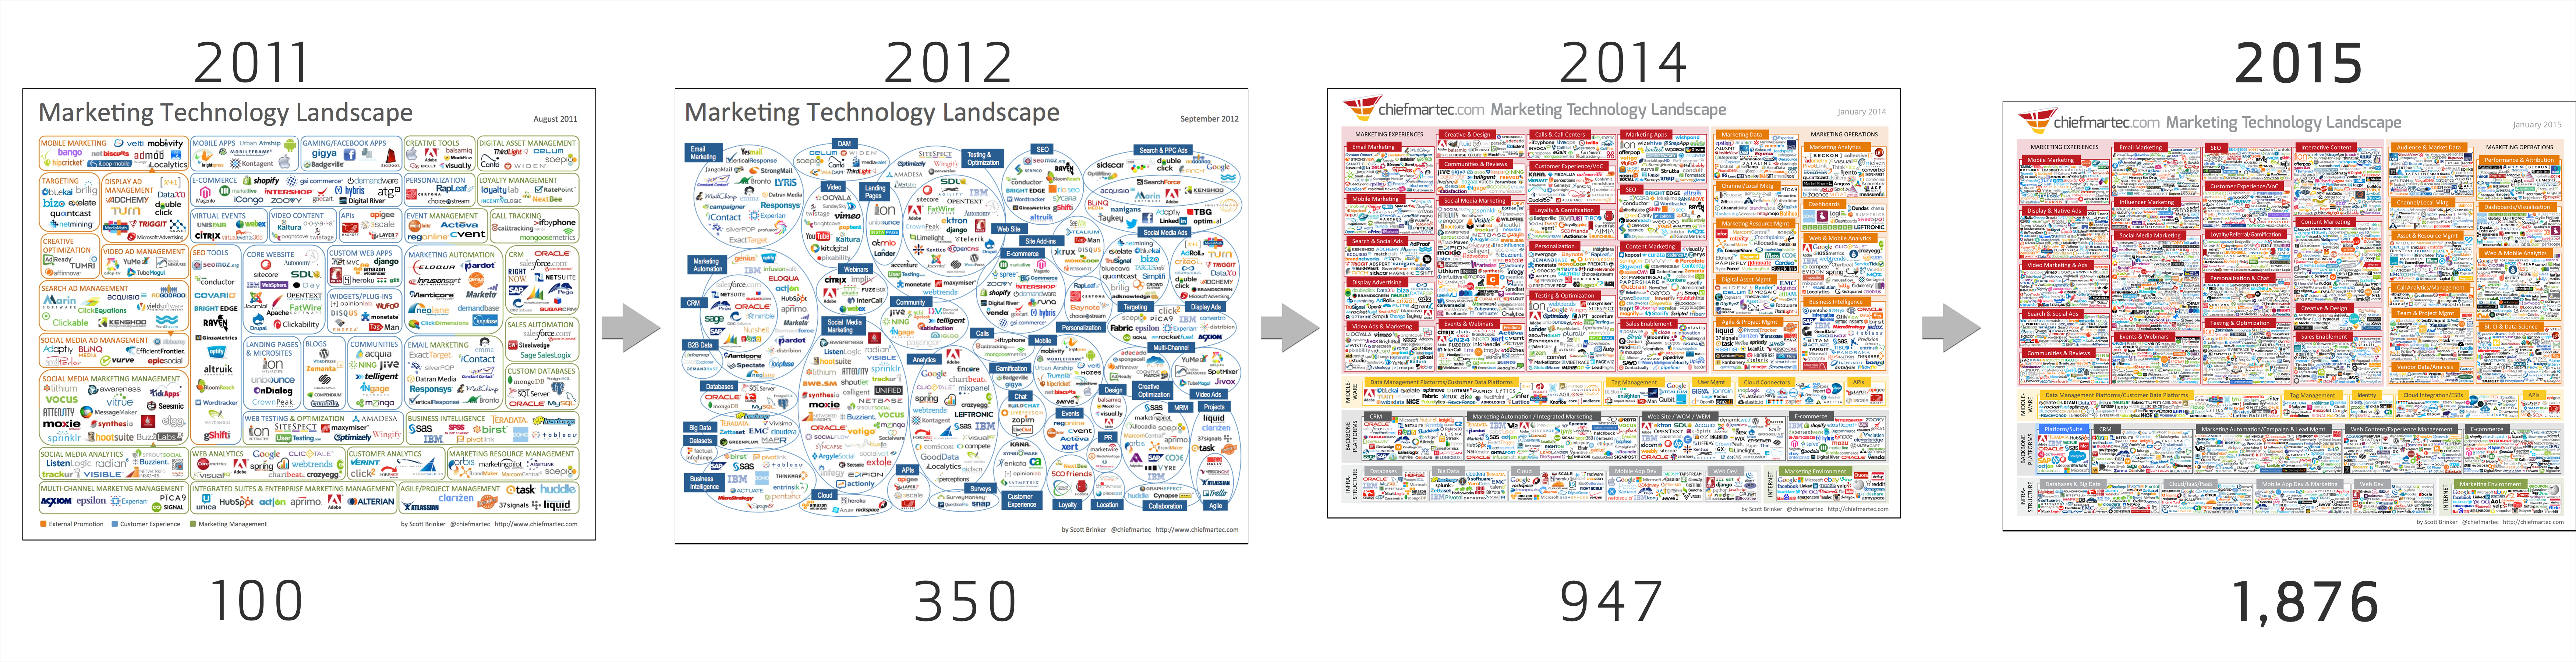 Marketing-Technology-Landscape-Evolution